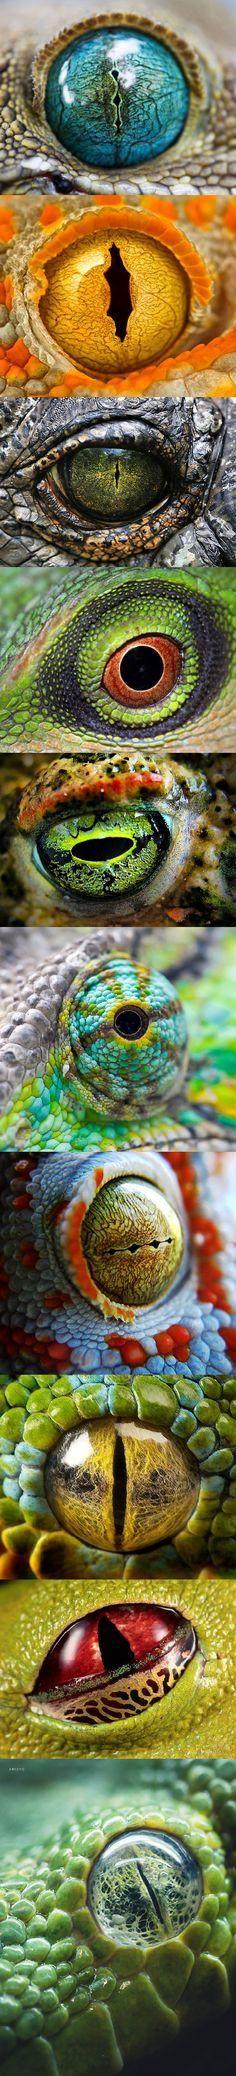 Reptile eyes